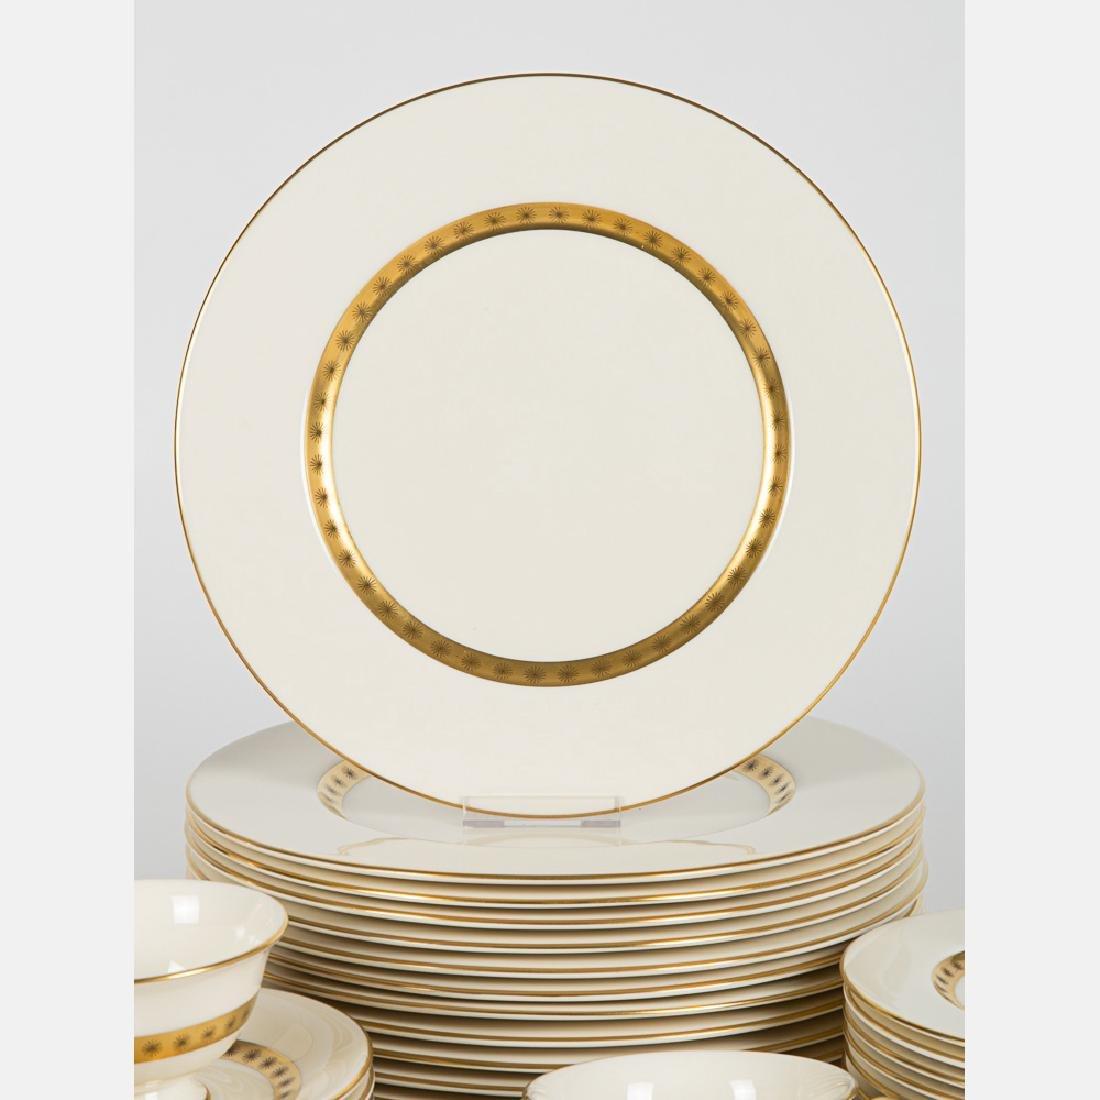 A Partial Castleton Porcelain Dinner Service in the - 3